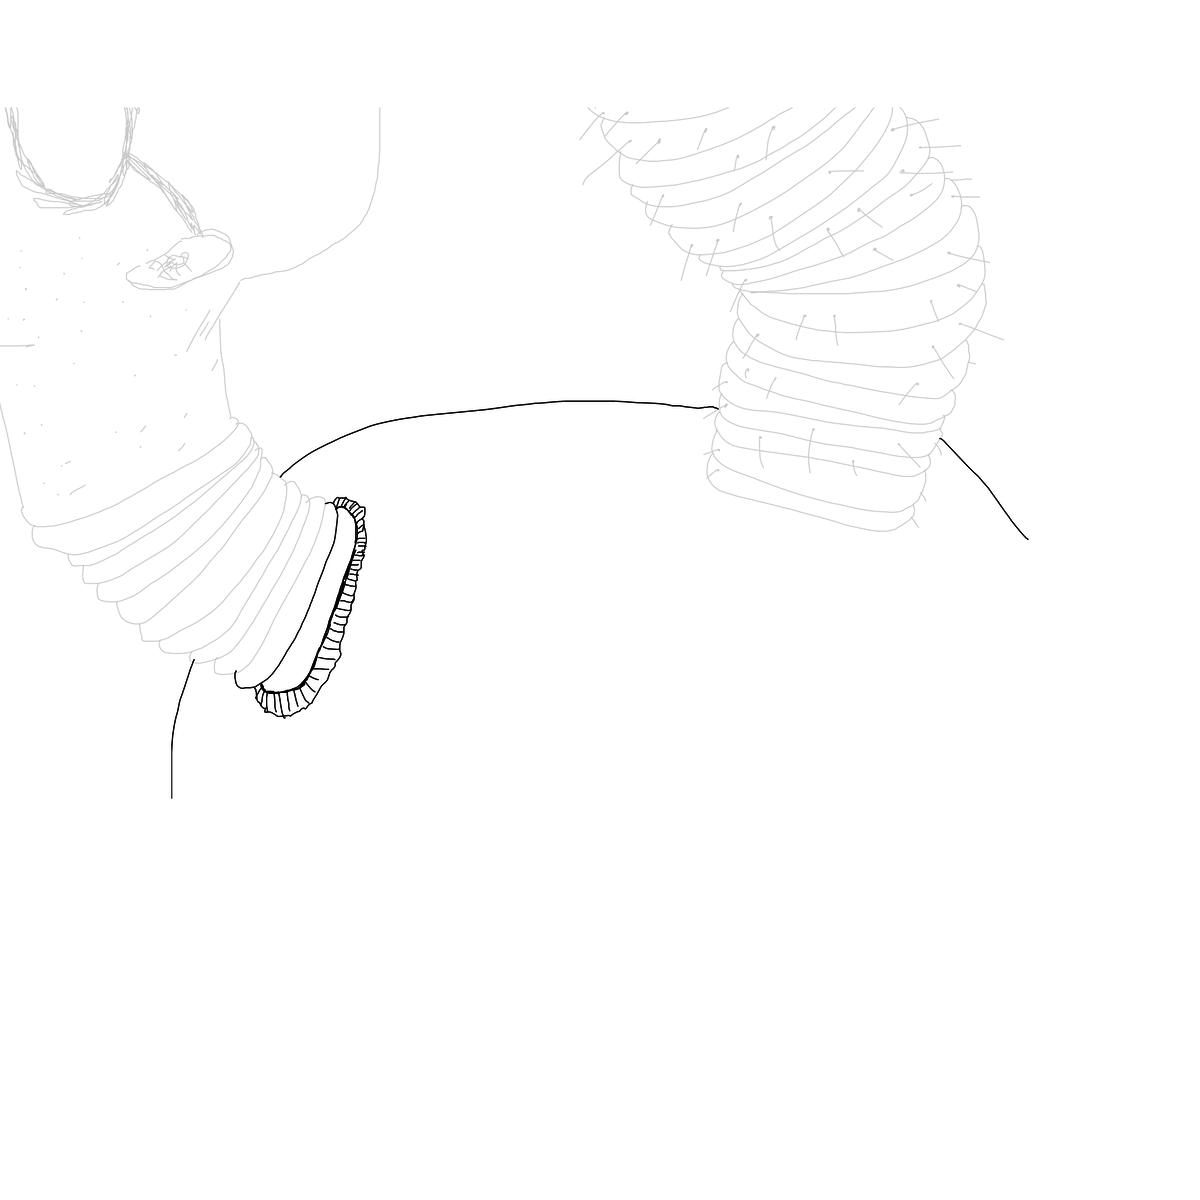 BAAAM drawing#16813 lat:52.4753074645996100lng: 13.4059247970581050